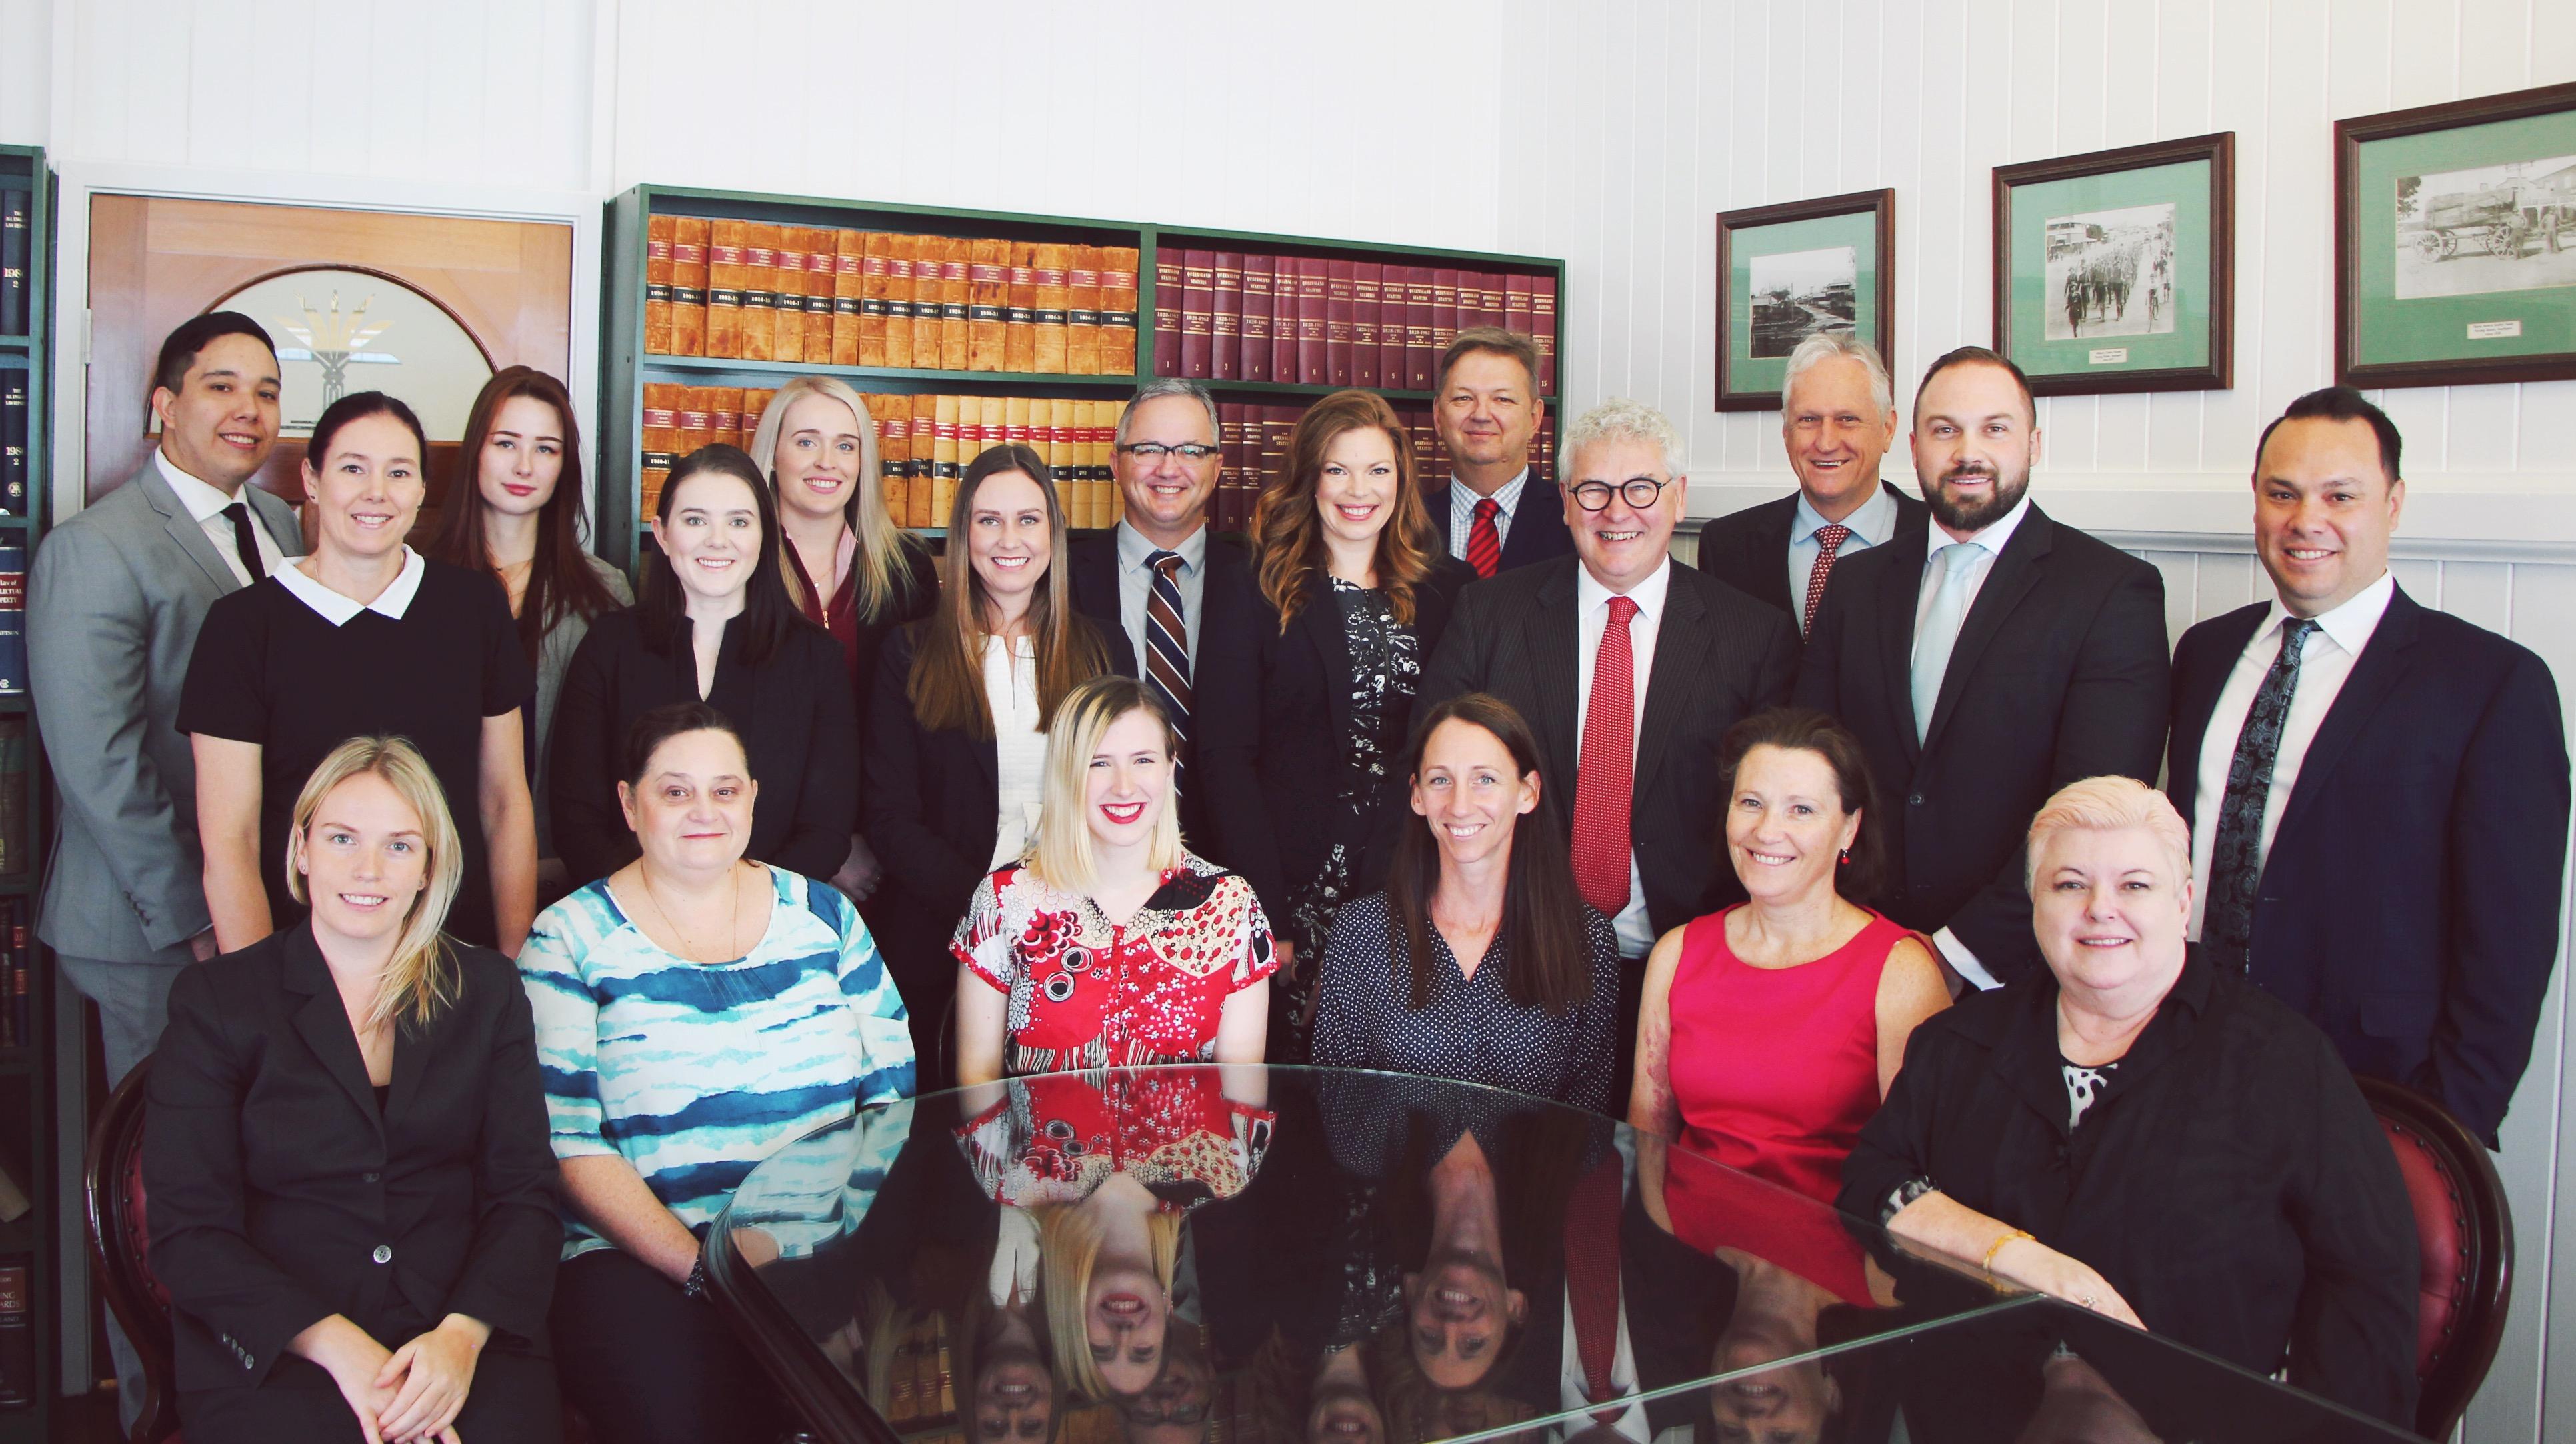 Criminal and Litigation Lawyers Brisbane & Gold Coast - Potts Lawyers